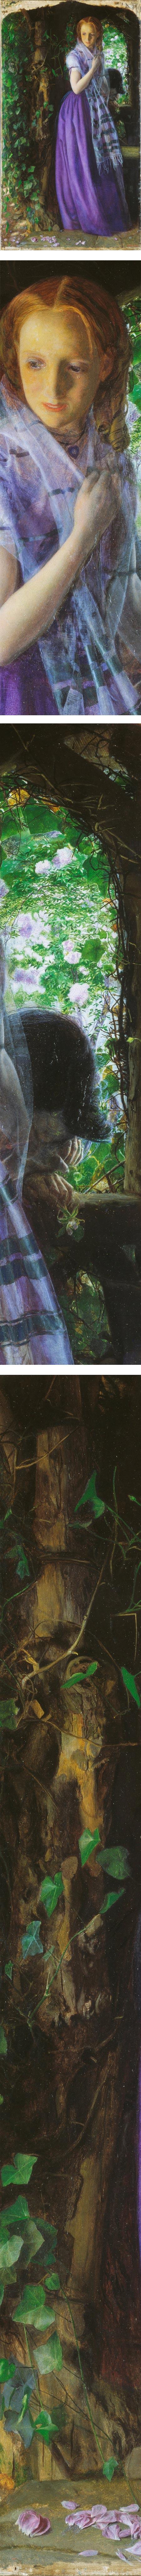 Aprii Love, Arthur Hughes, Pre-Raphaelite painter